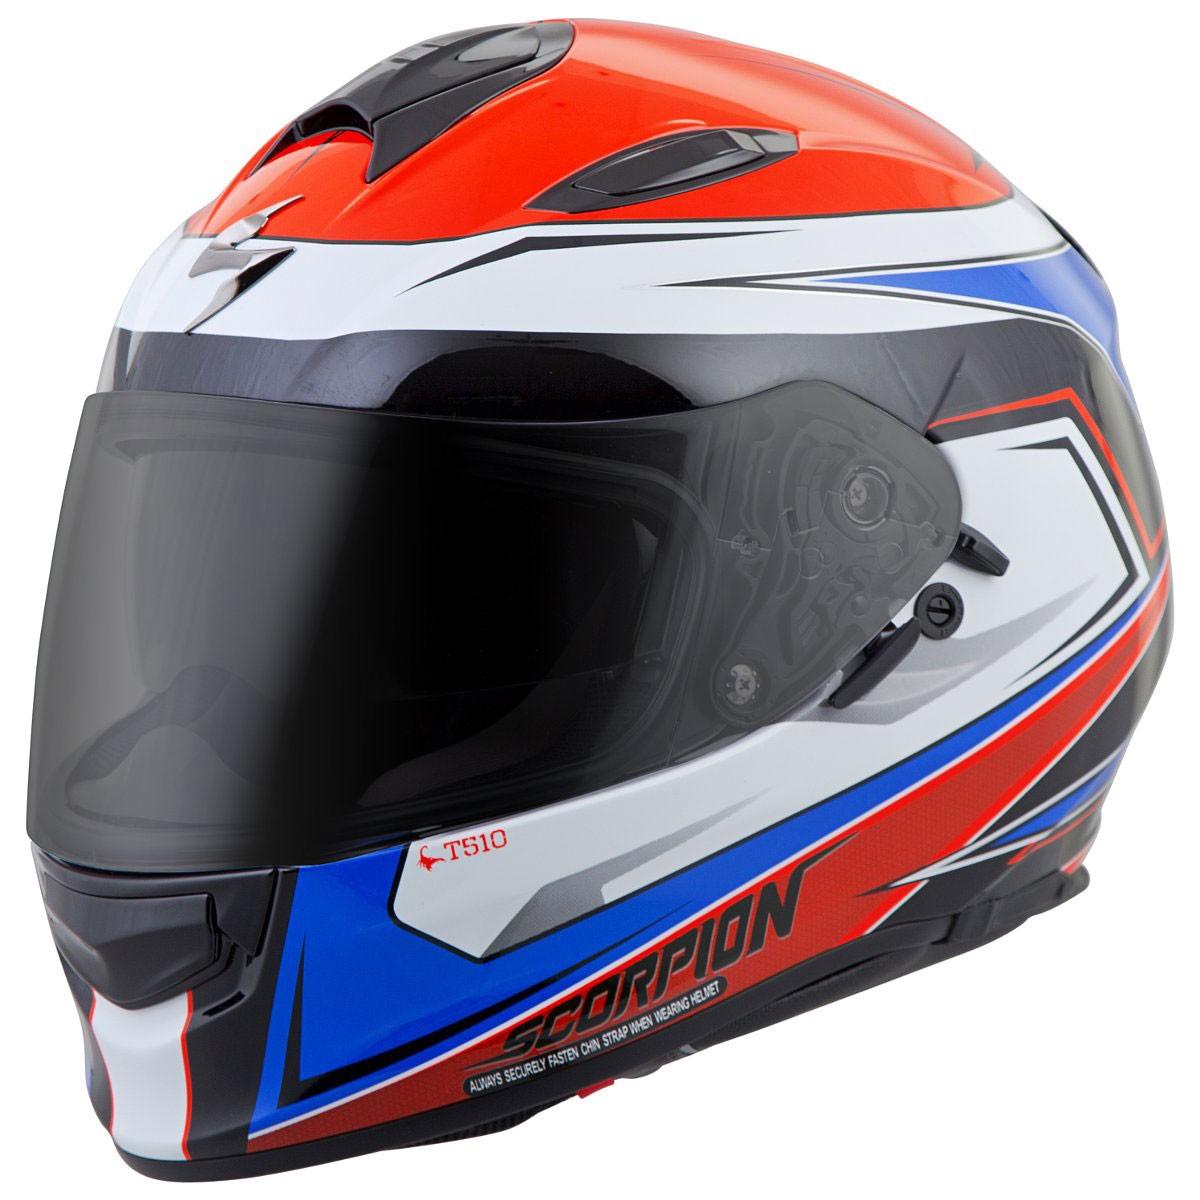 scorpion exo t510 k c cycle helmet world. Black Bedroom Furniture Sets. Home Design Ideas